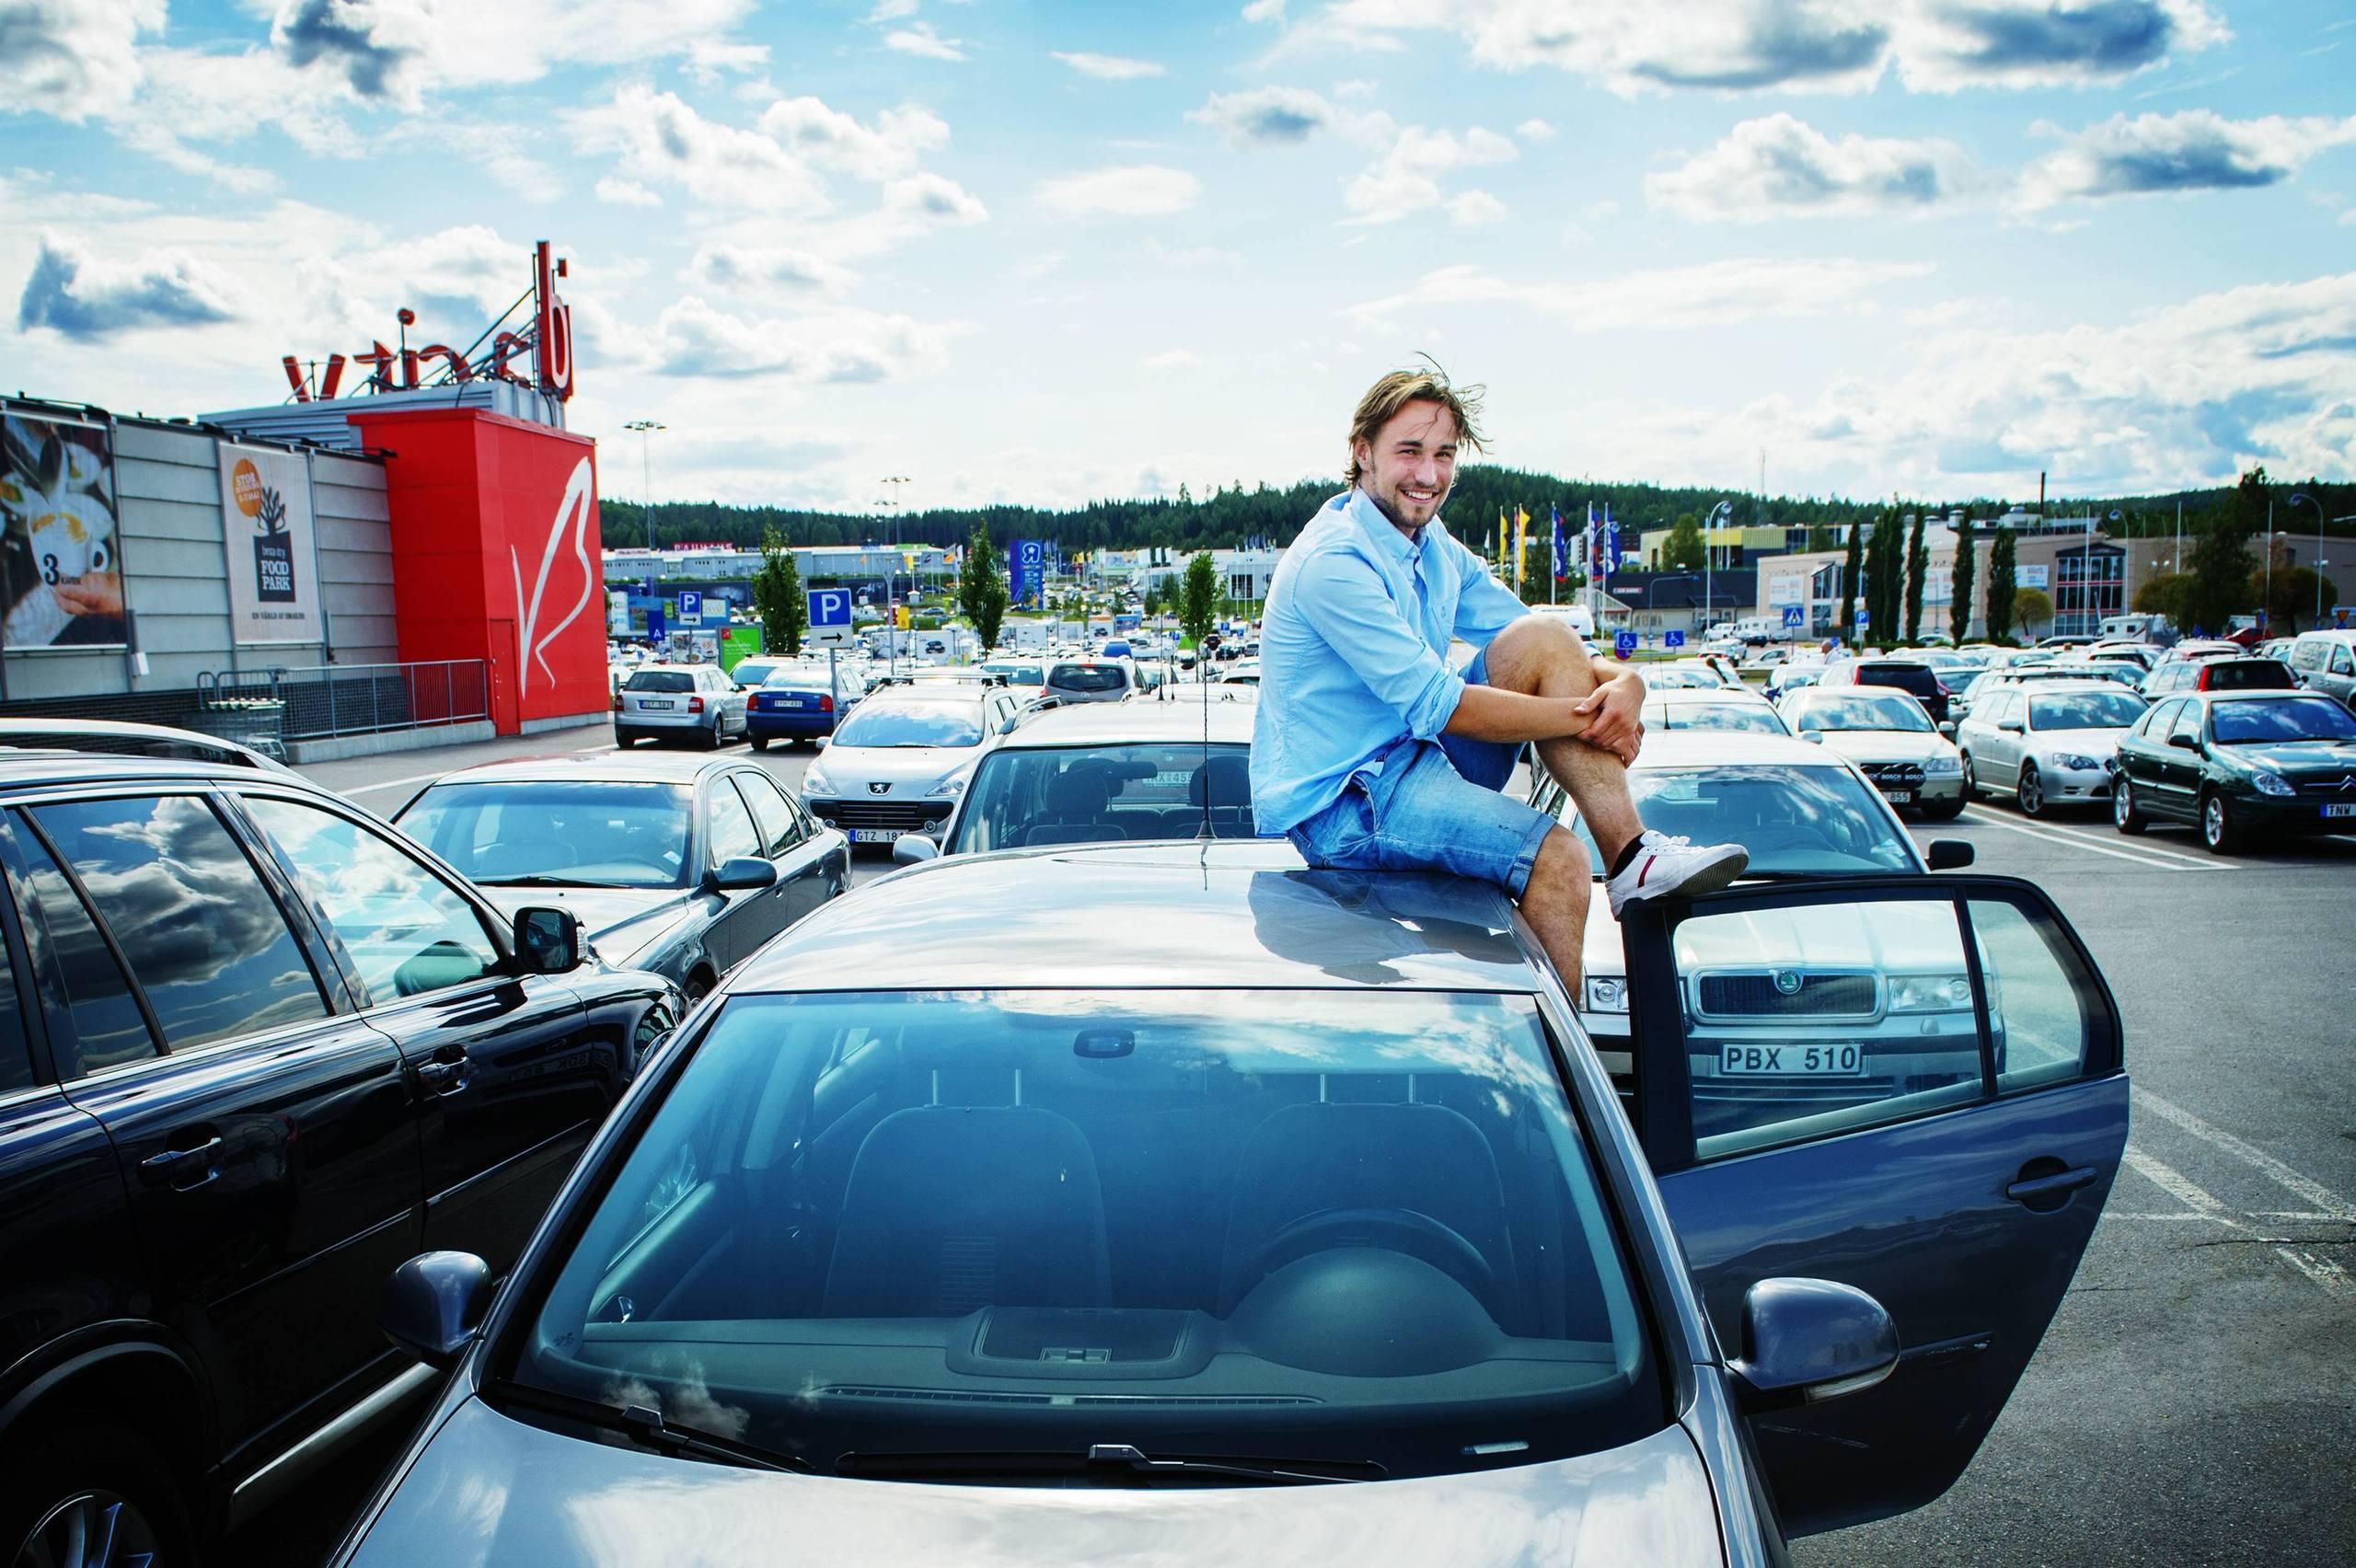 Svenskor kan tvingas byta klubb